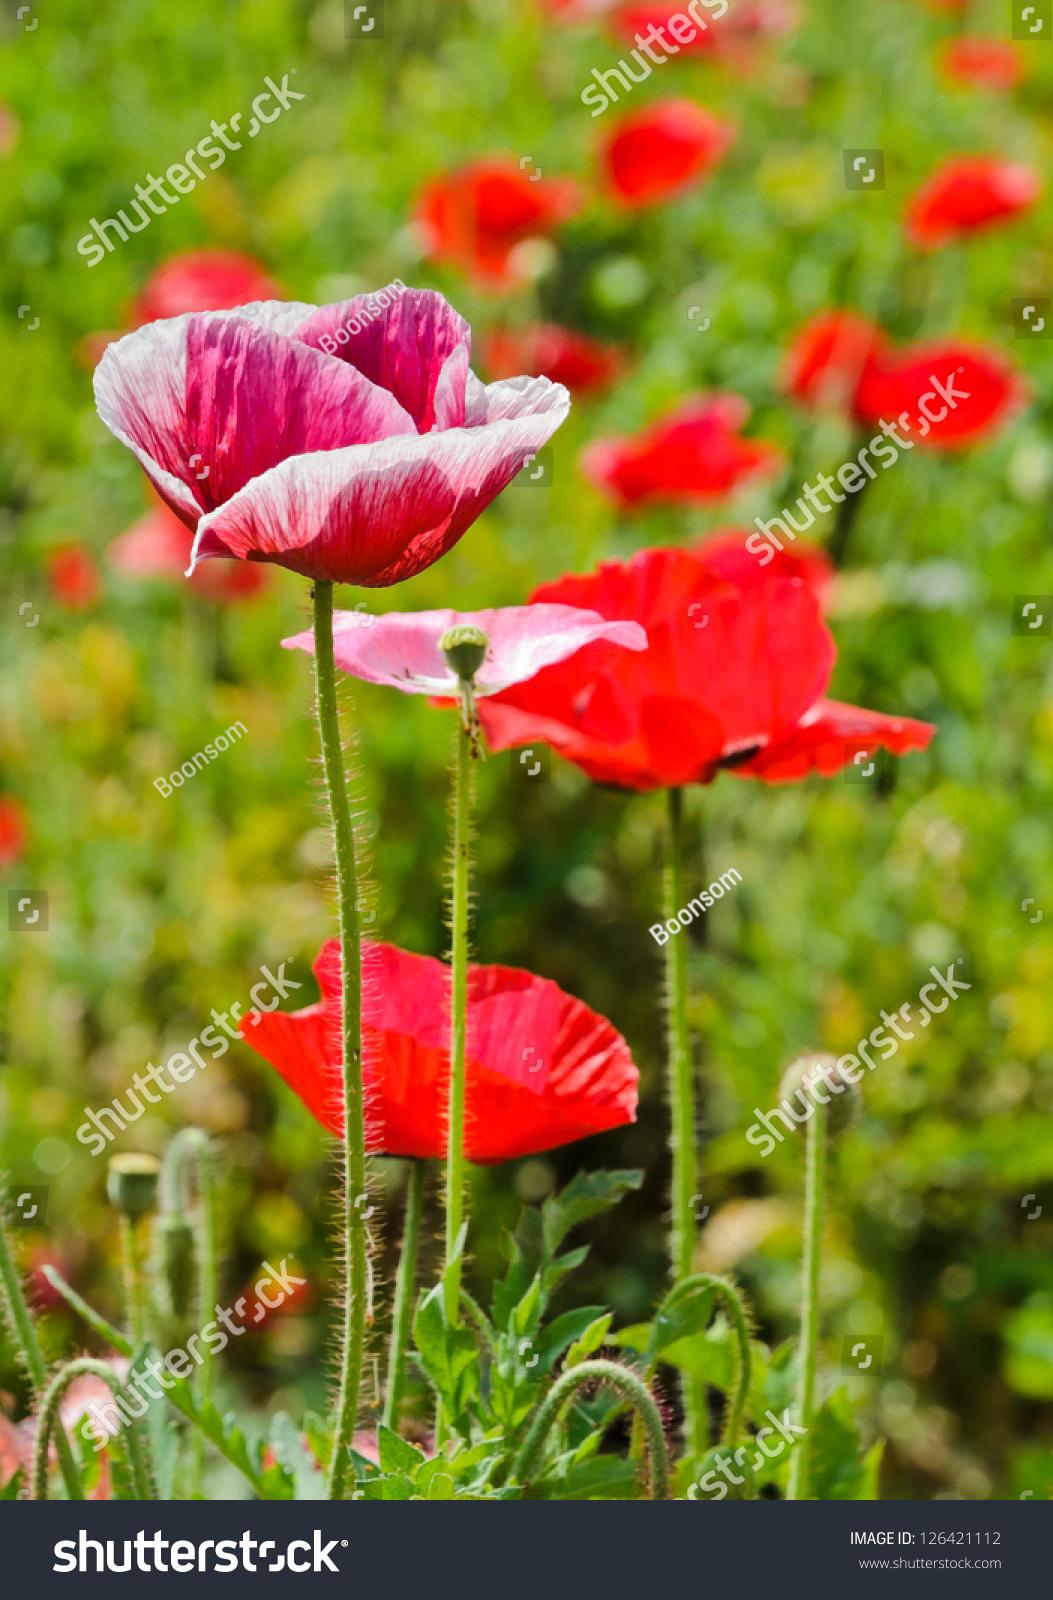 Opium Poppy Flower Field Stock Photo Royalty Free 126421112